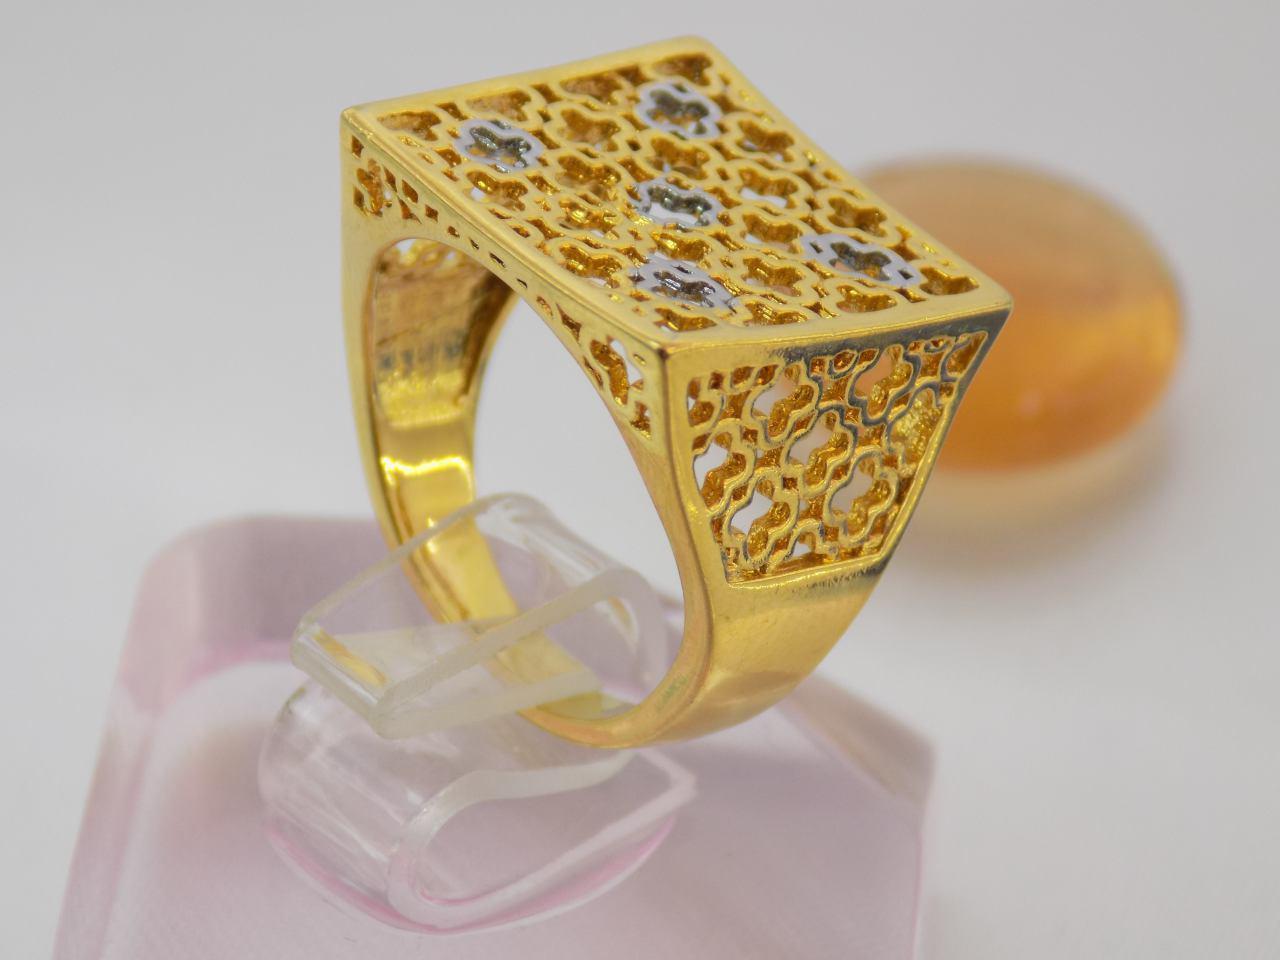 انگشتر زنانه استیل مربعی طرح طلا rg-n111